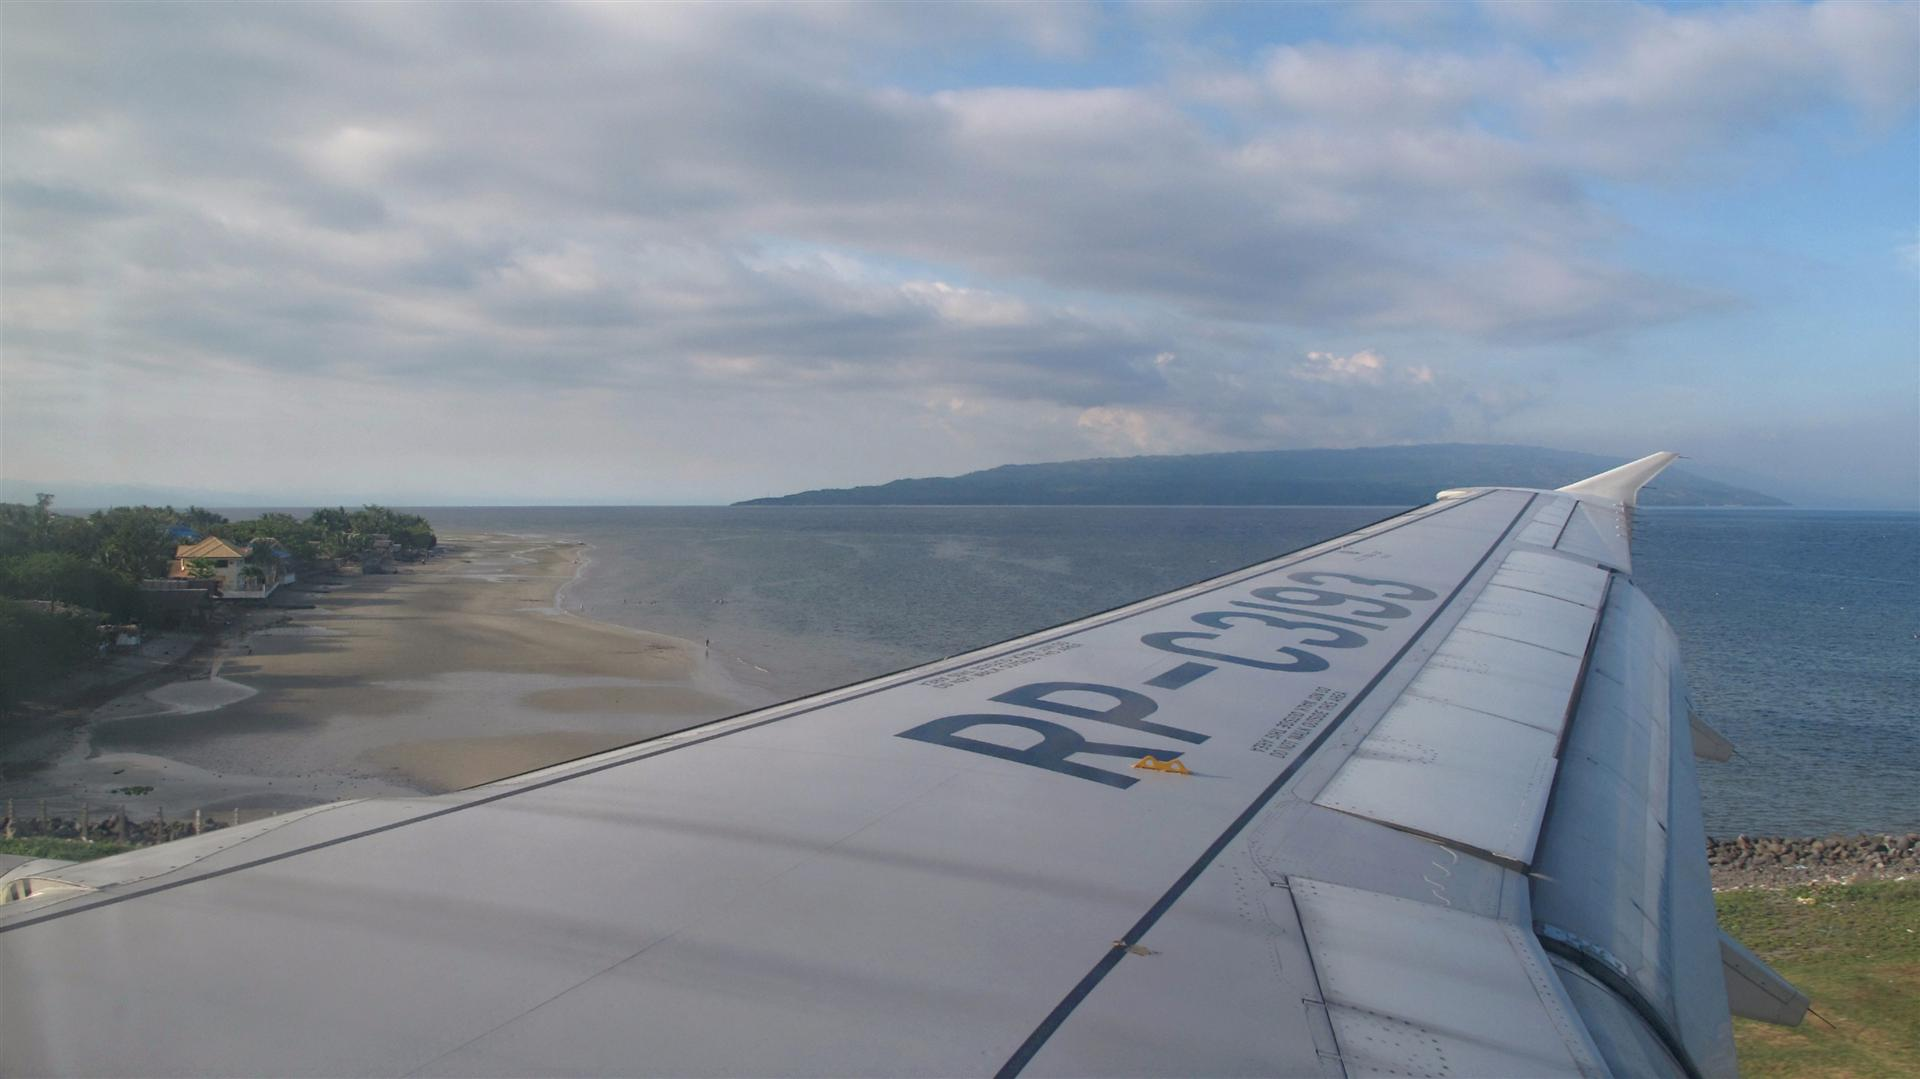 Anflug auf Dumaguete - 2